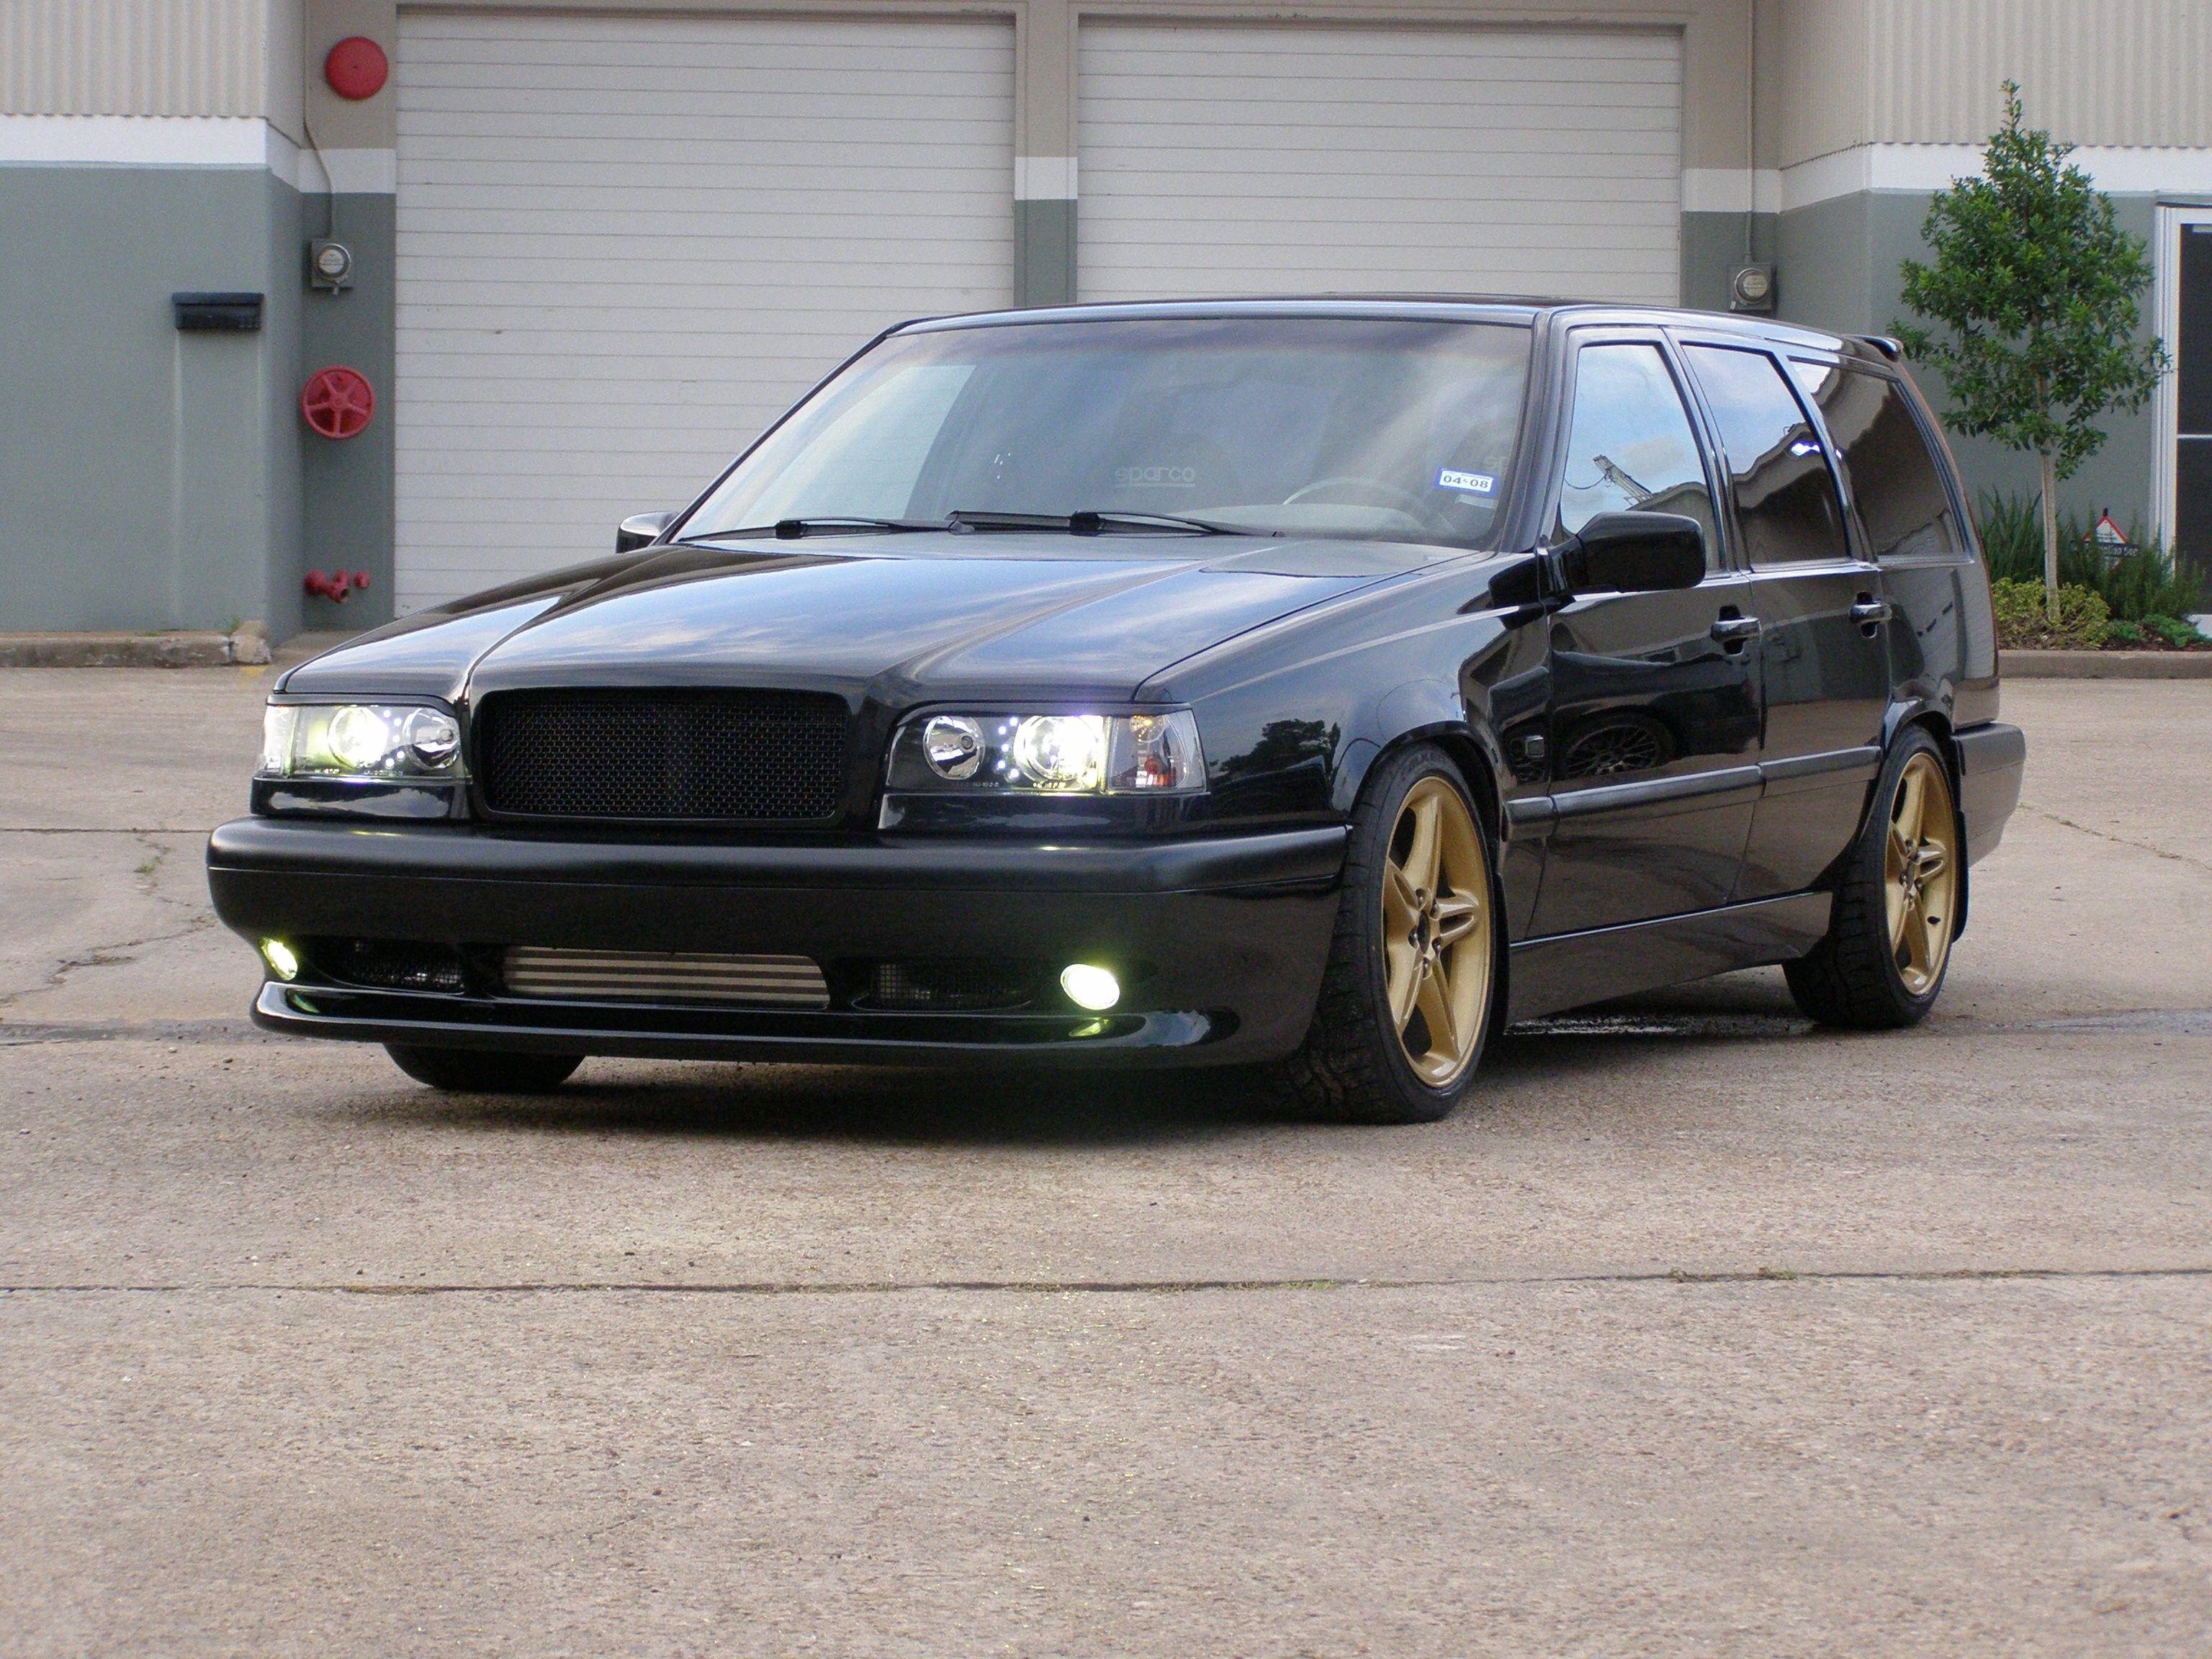 Volvo 850 Wagon | Volvo 850 Wagon | Pinterest | Volvo 850 and Volvo